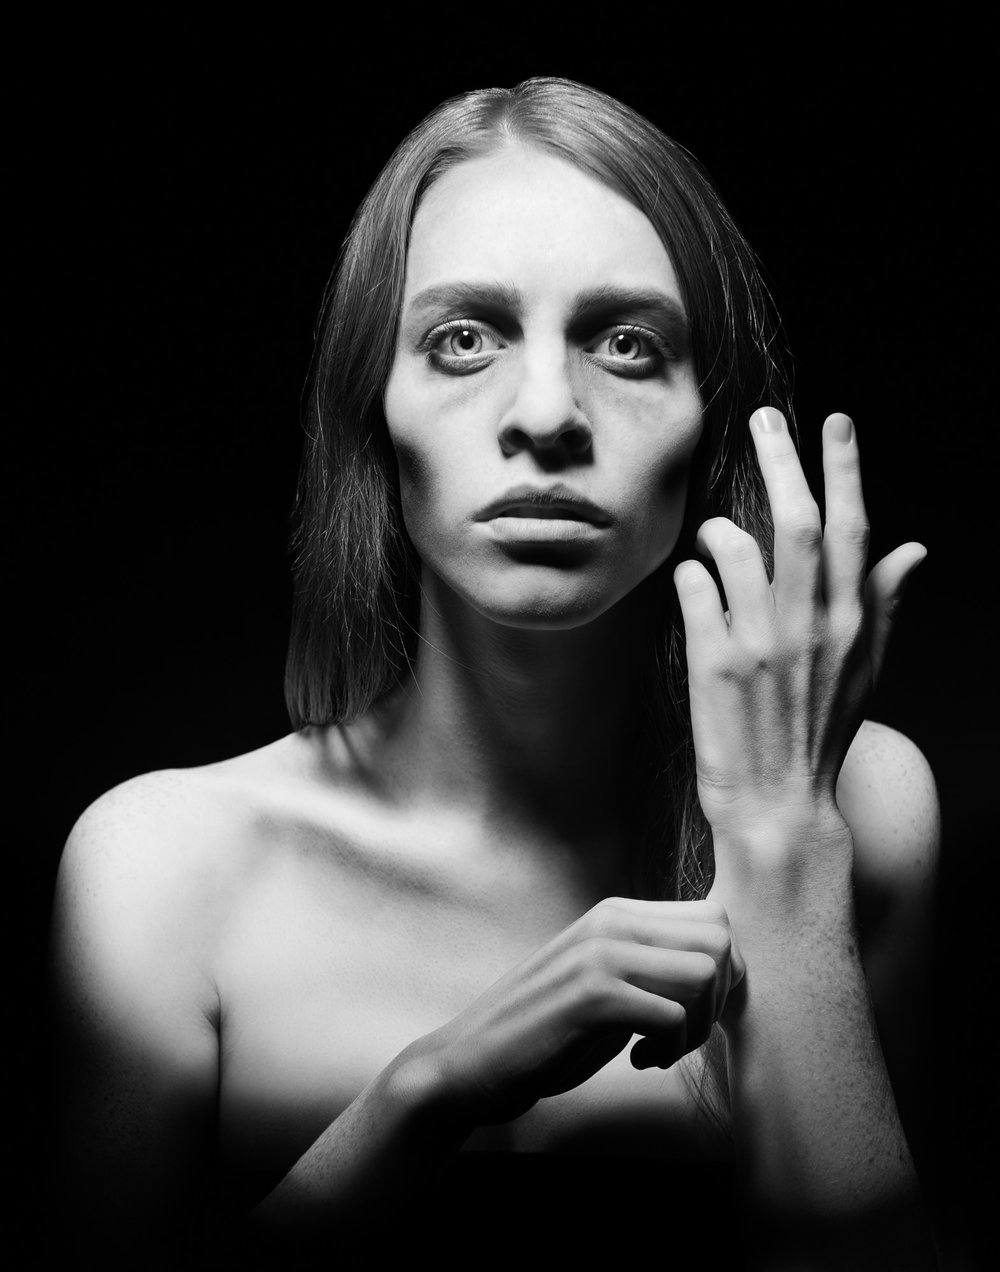 PortraitPortfolio-12.jpg